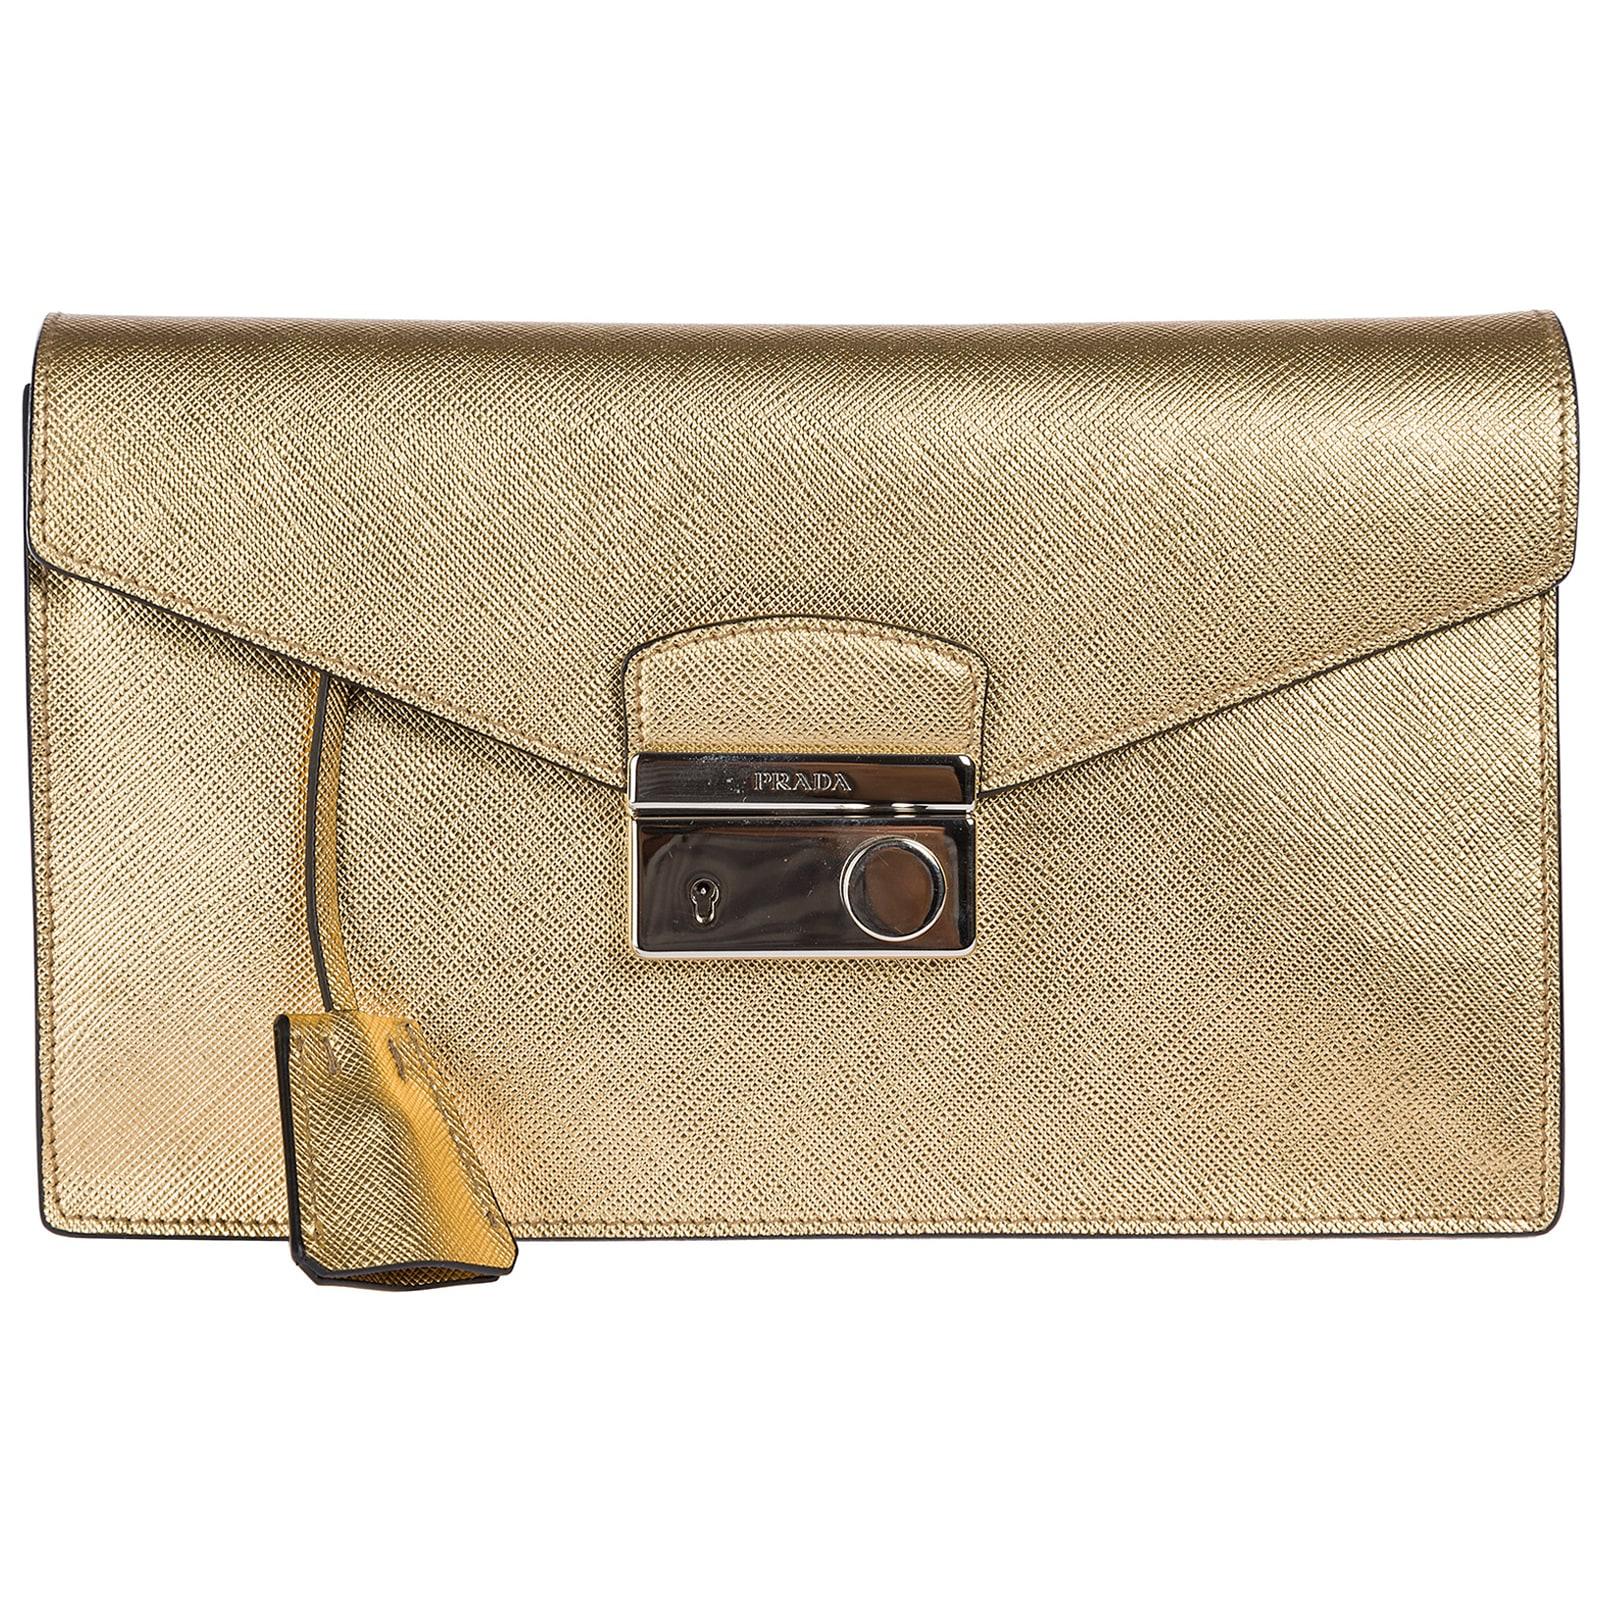 Prada Space Plein Clutch Bag